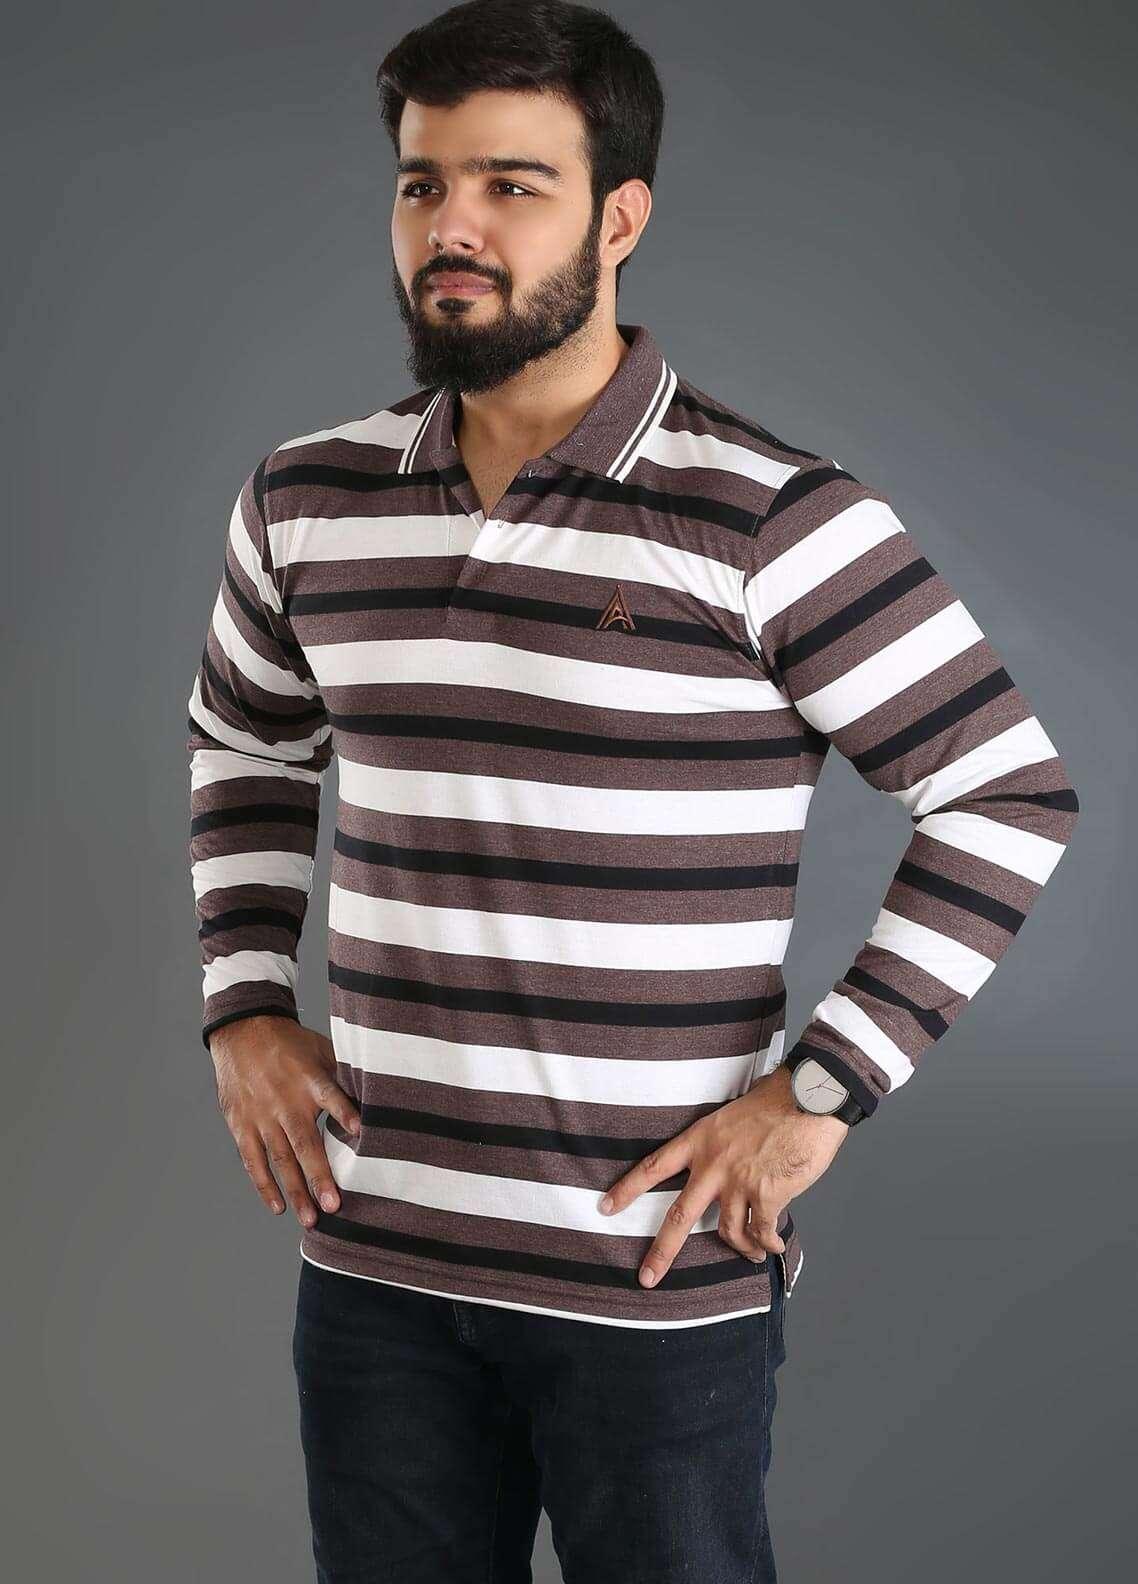 Anchor Jersey Polo Men T-Shirts - Multi A-233